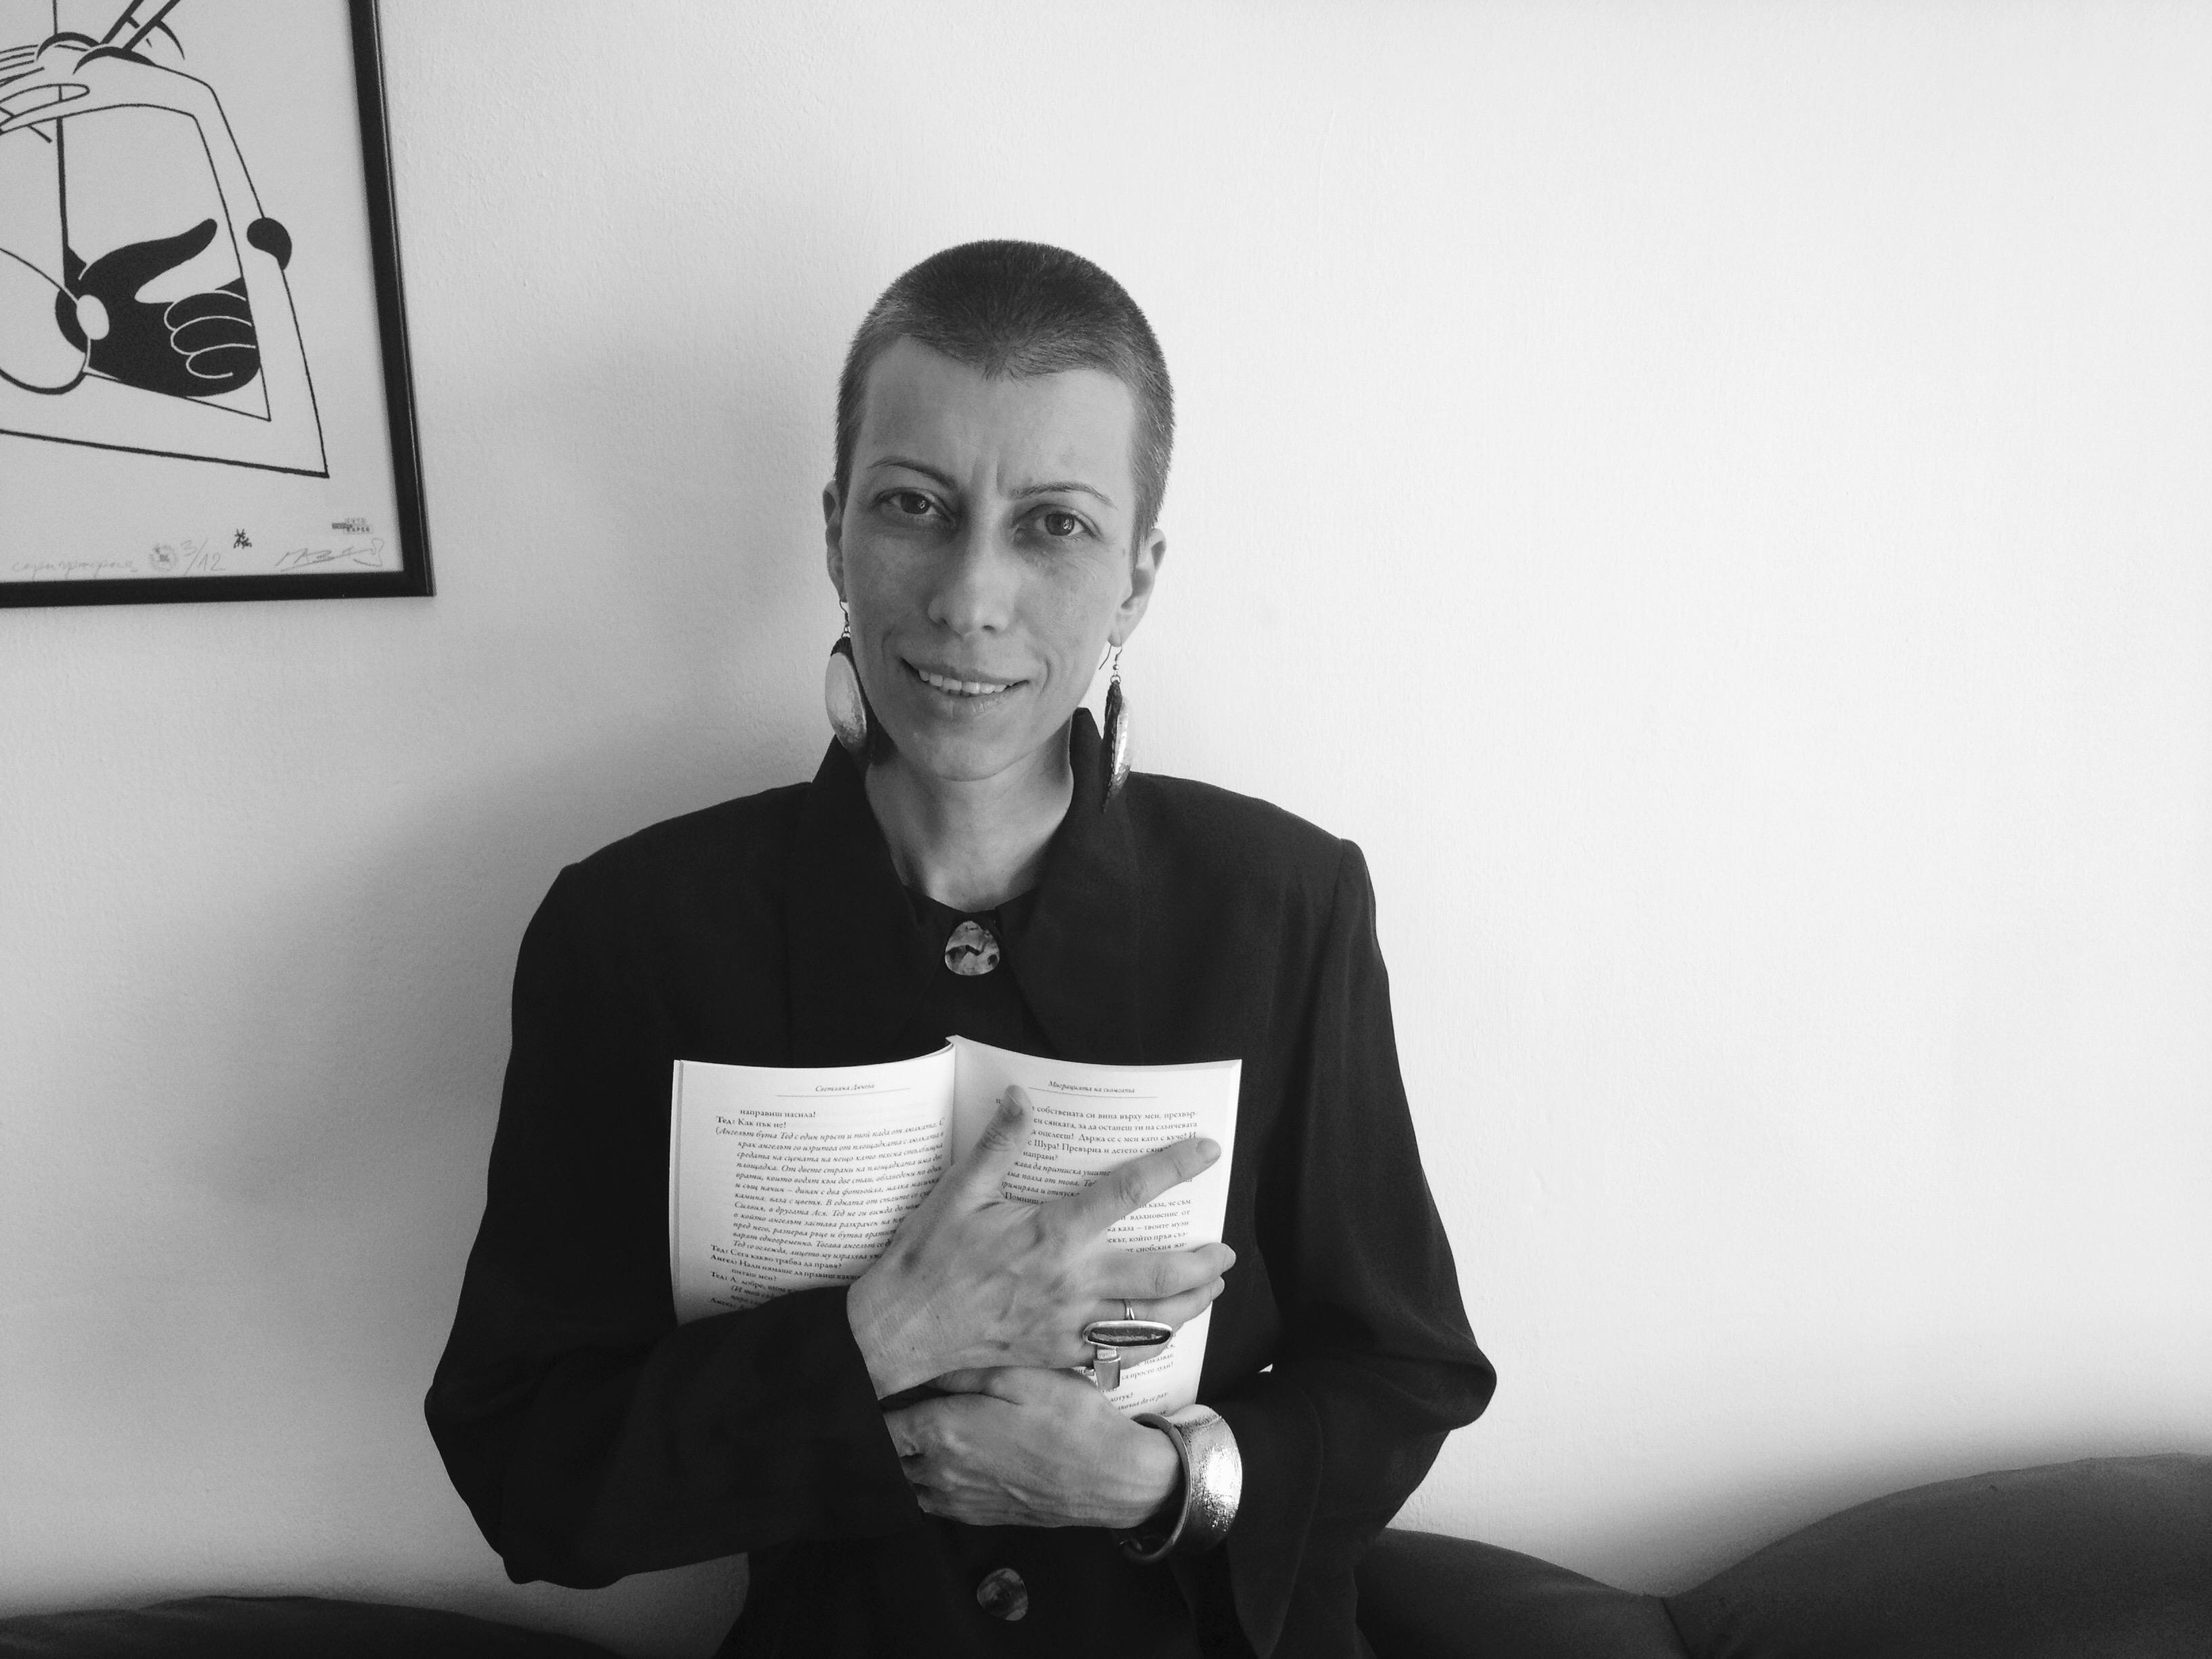 Jimmy neutroni homo porno vapaa Phat musta pillua porno